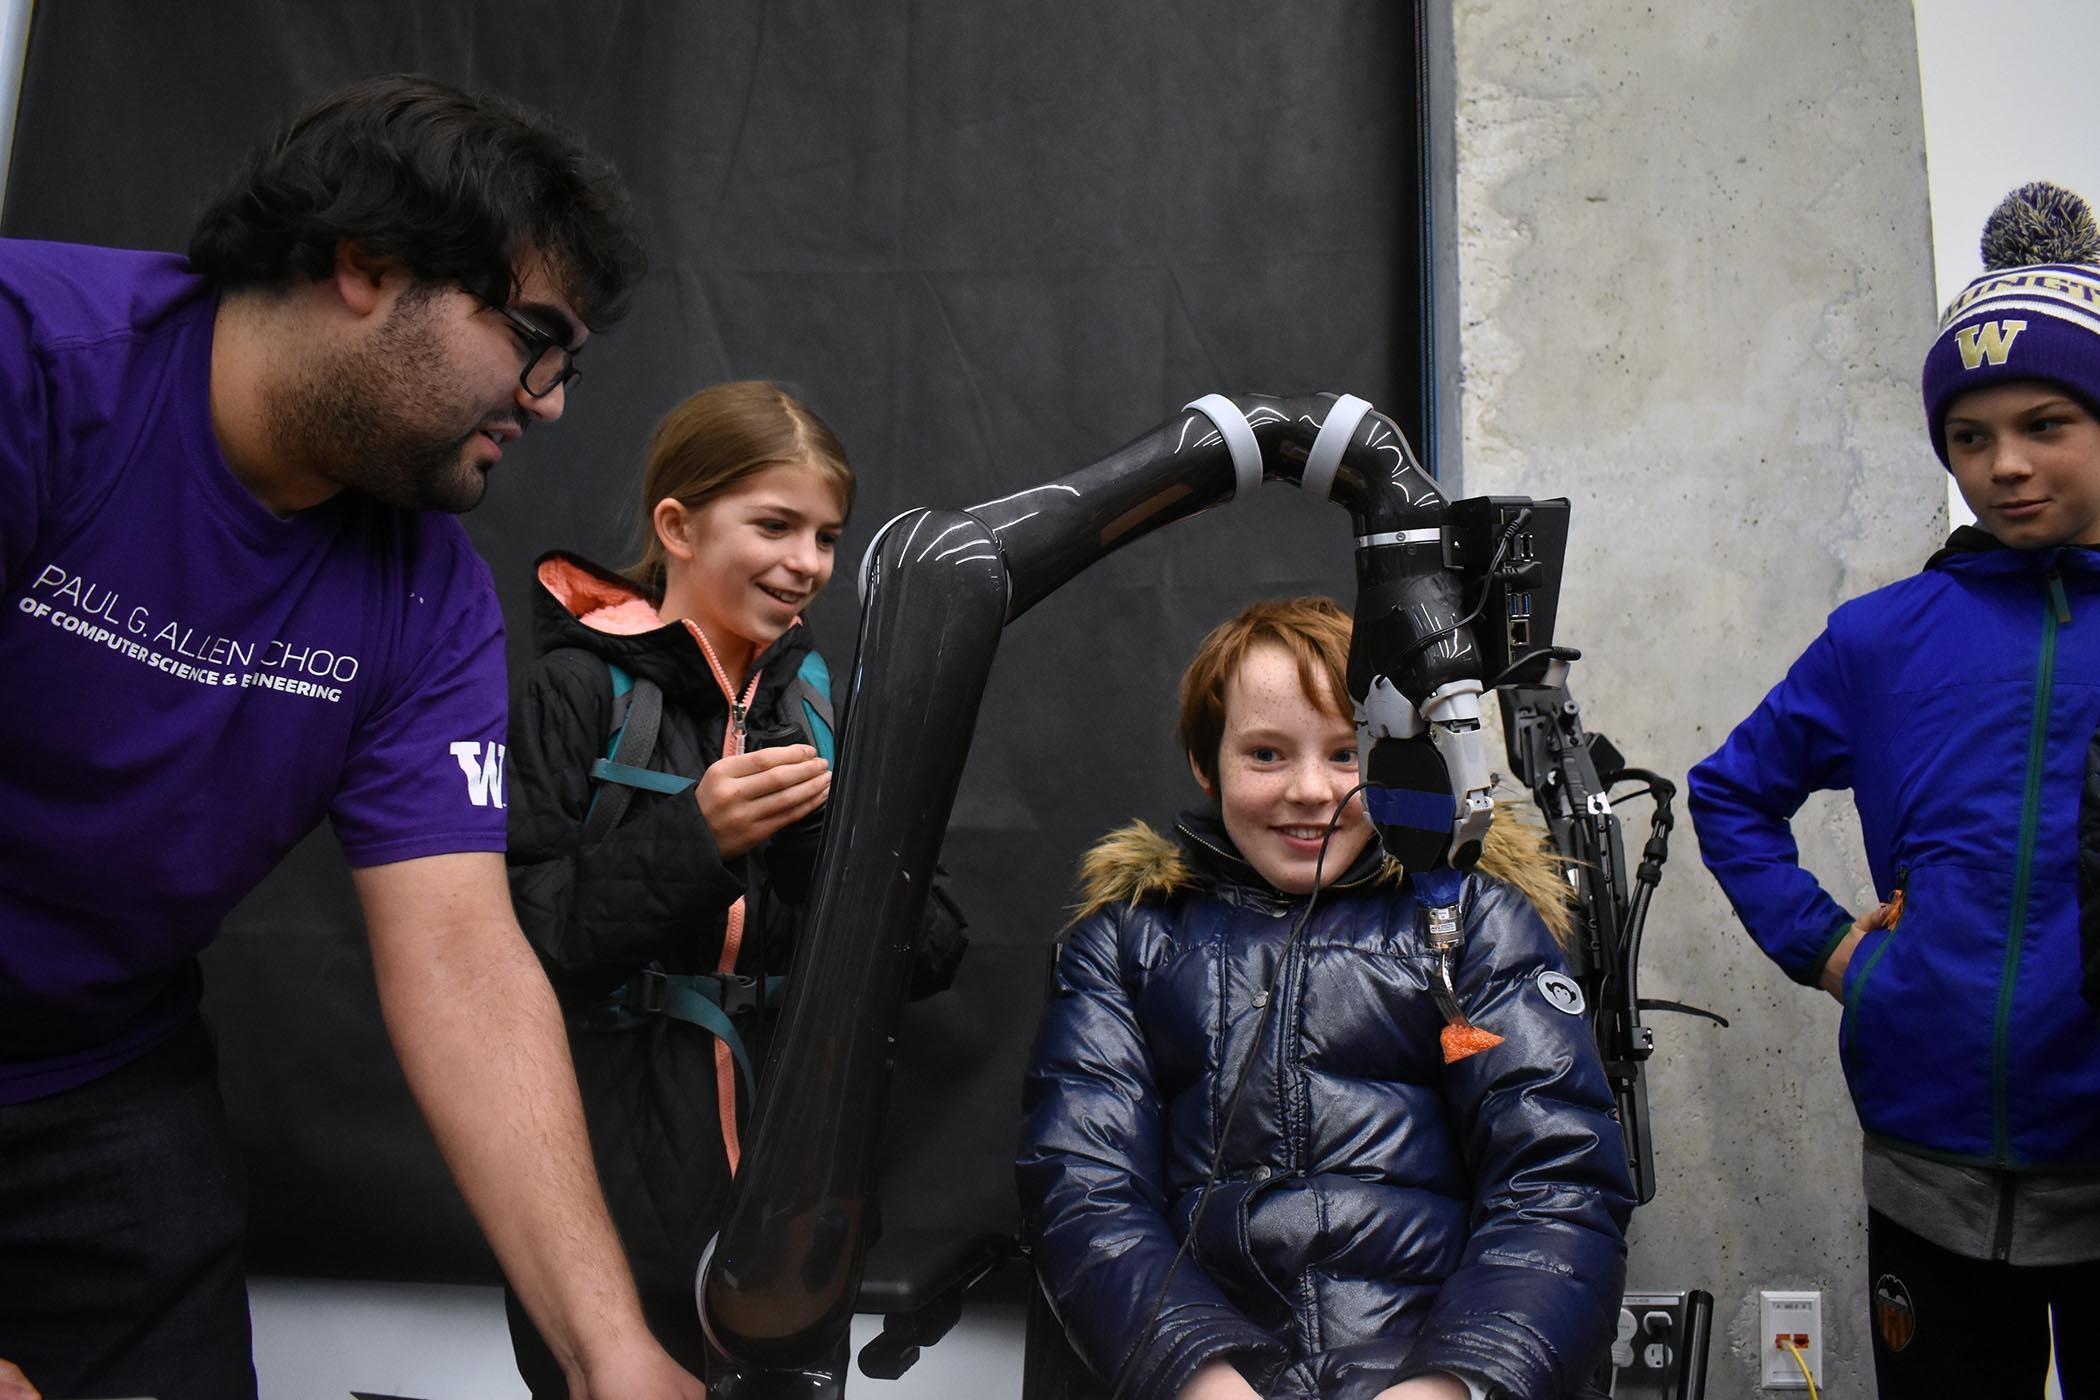 2020 Uw Robotics Lab Hero